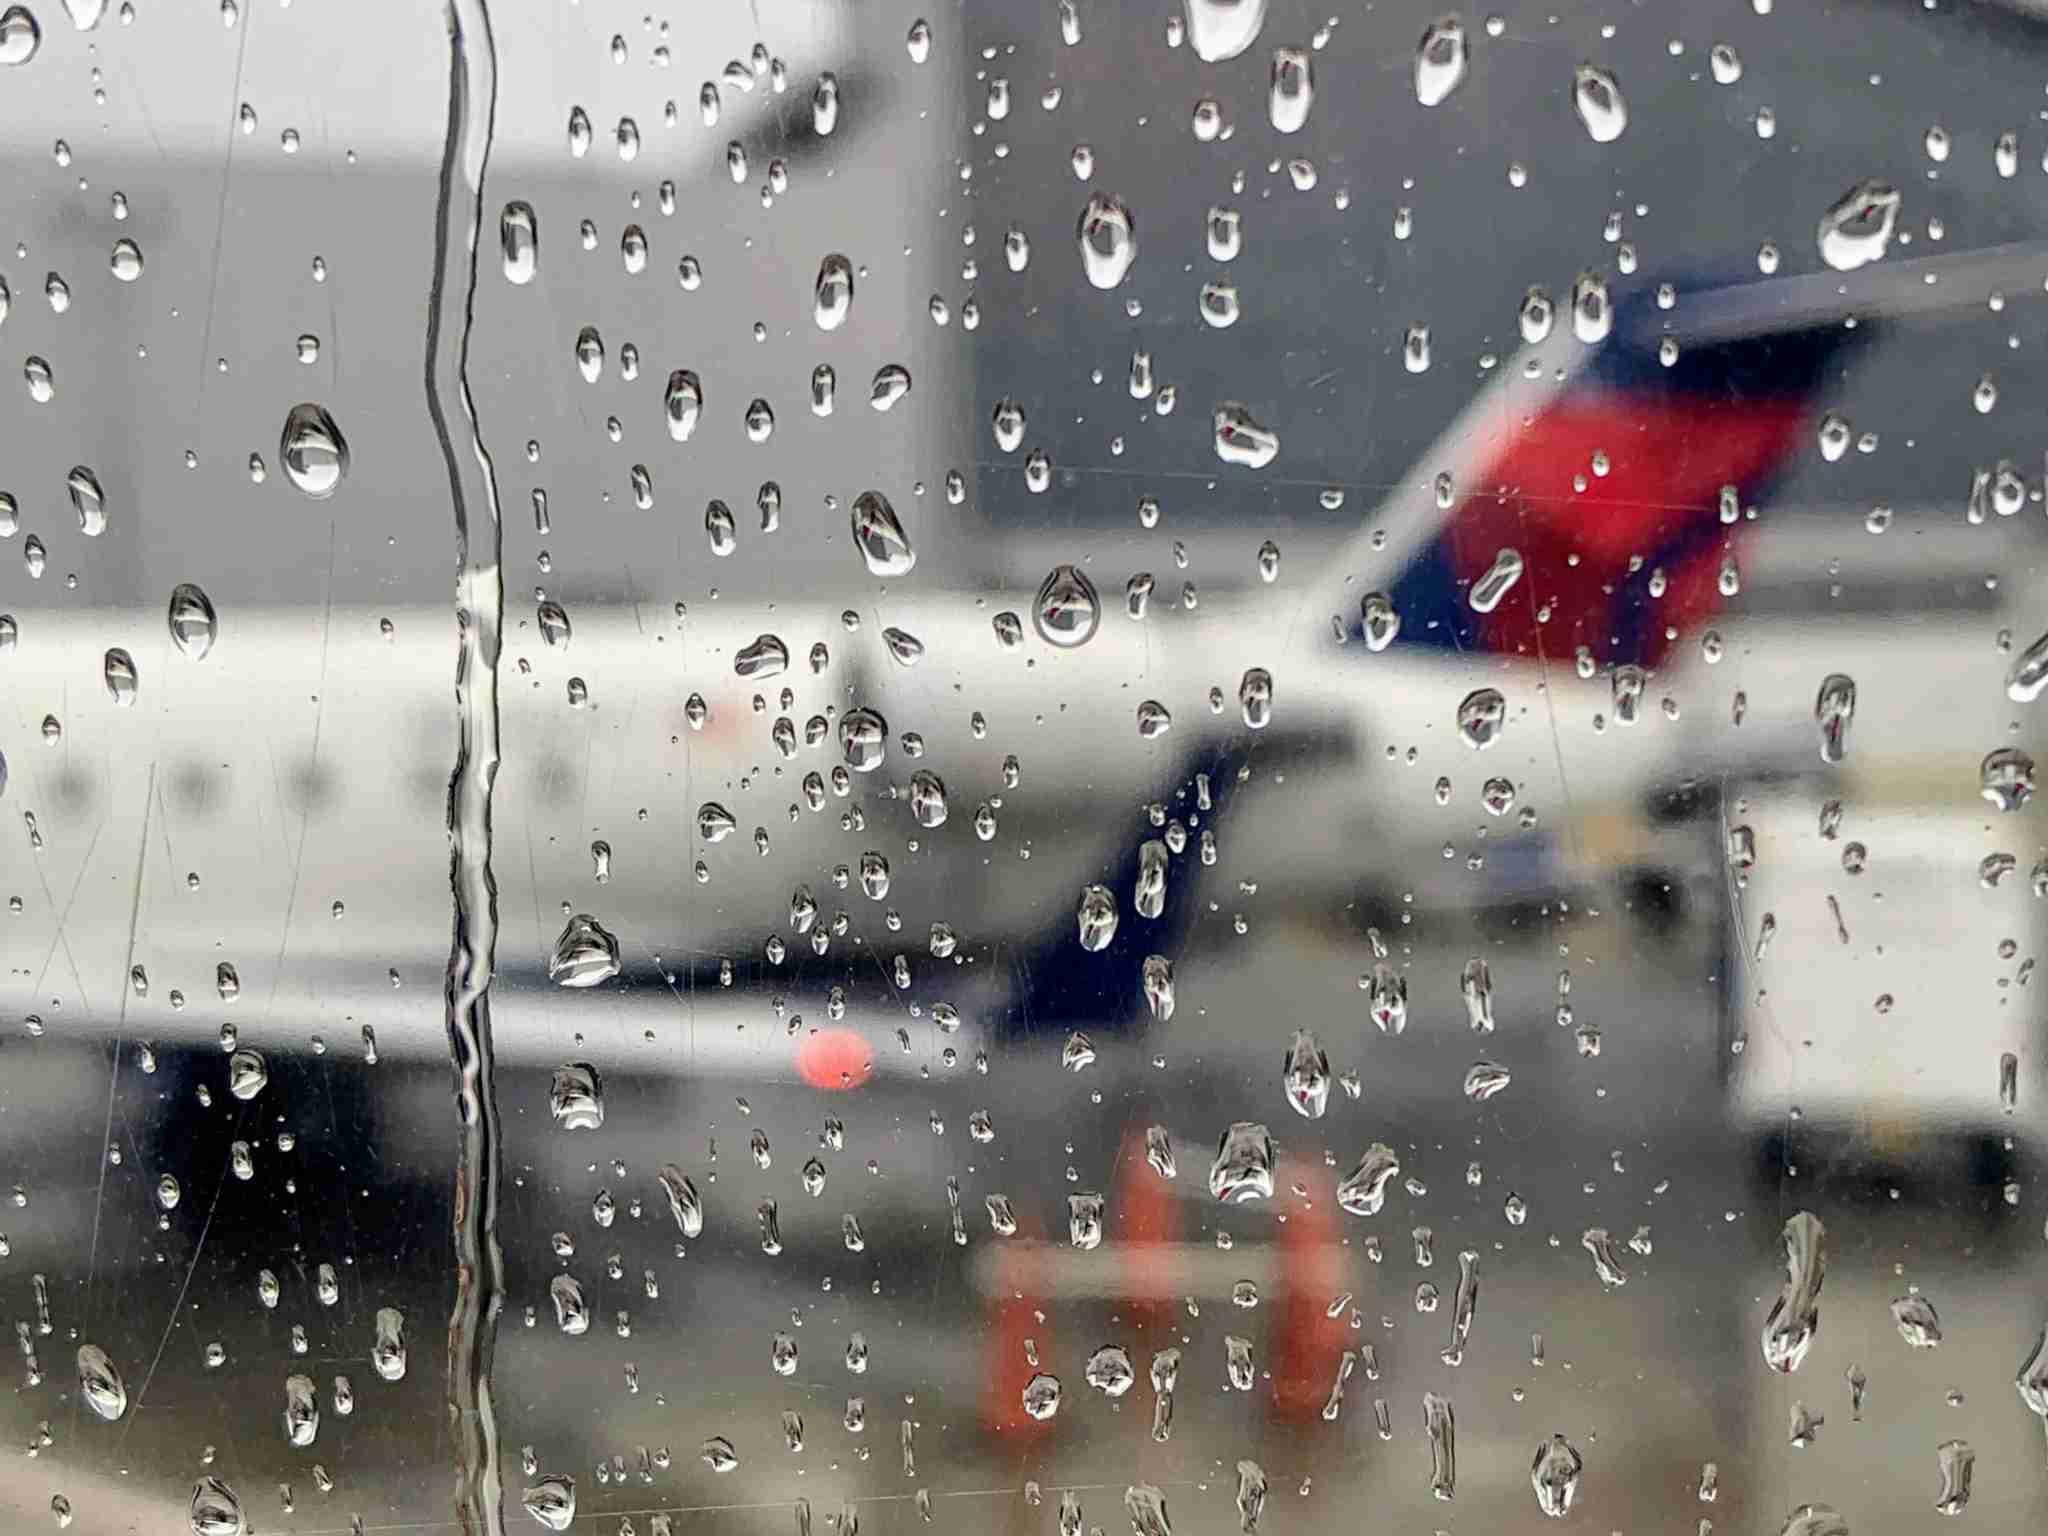 Delta Flight Delay Weather Rain Window